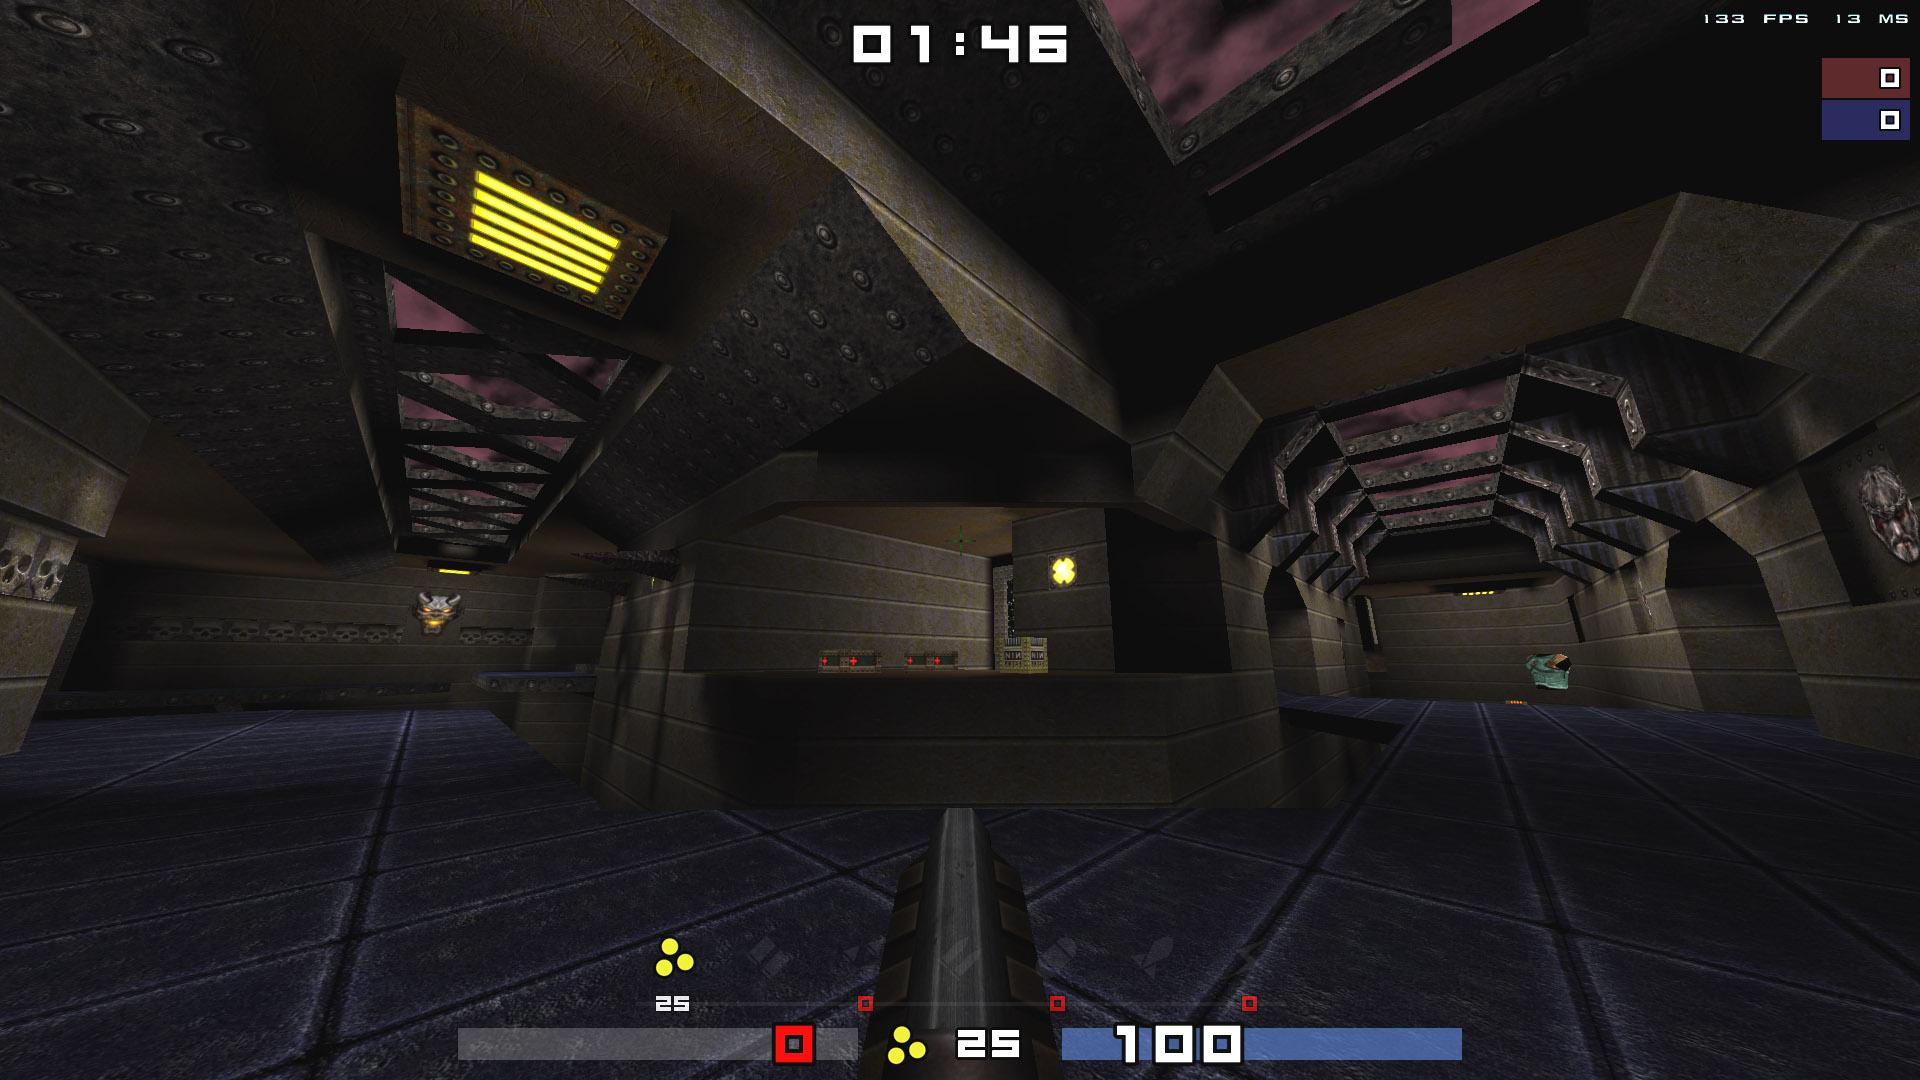 http://www.redshift.hu/sylon/junkdrome1.jpg